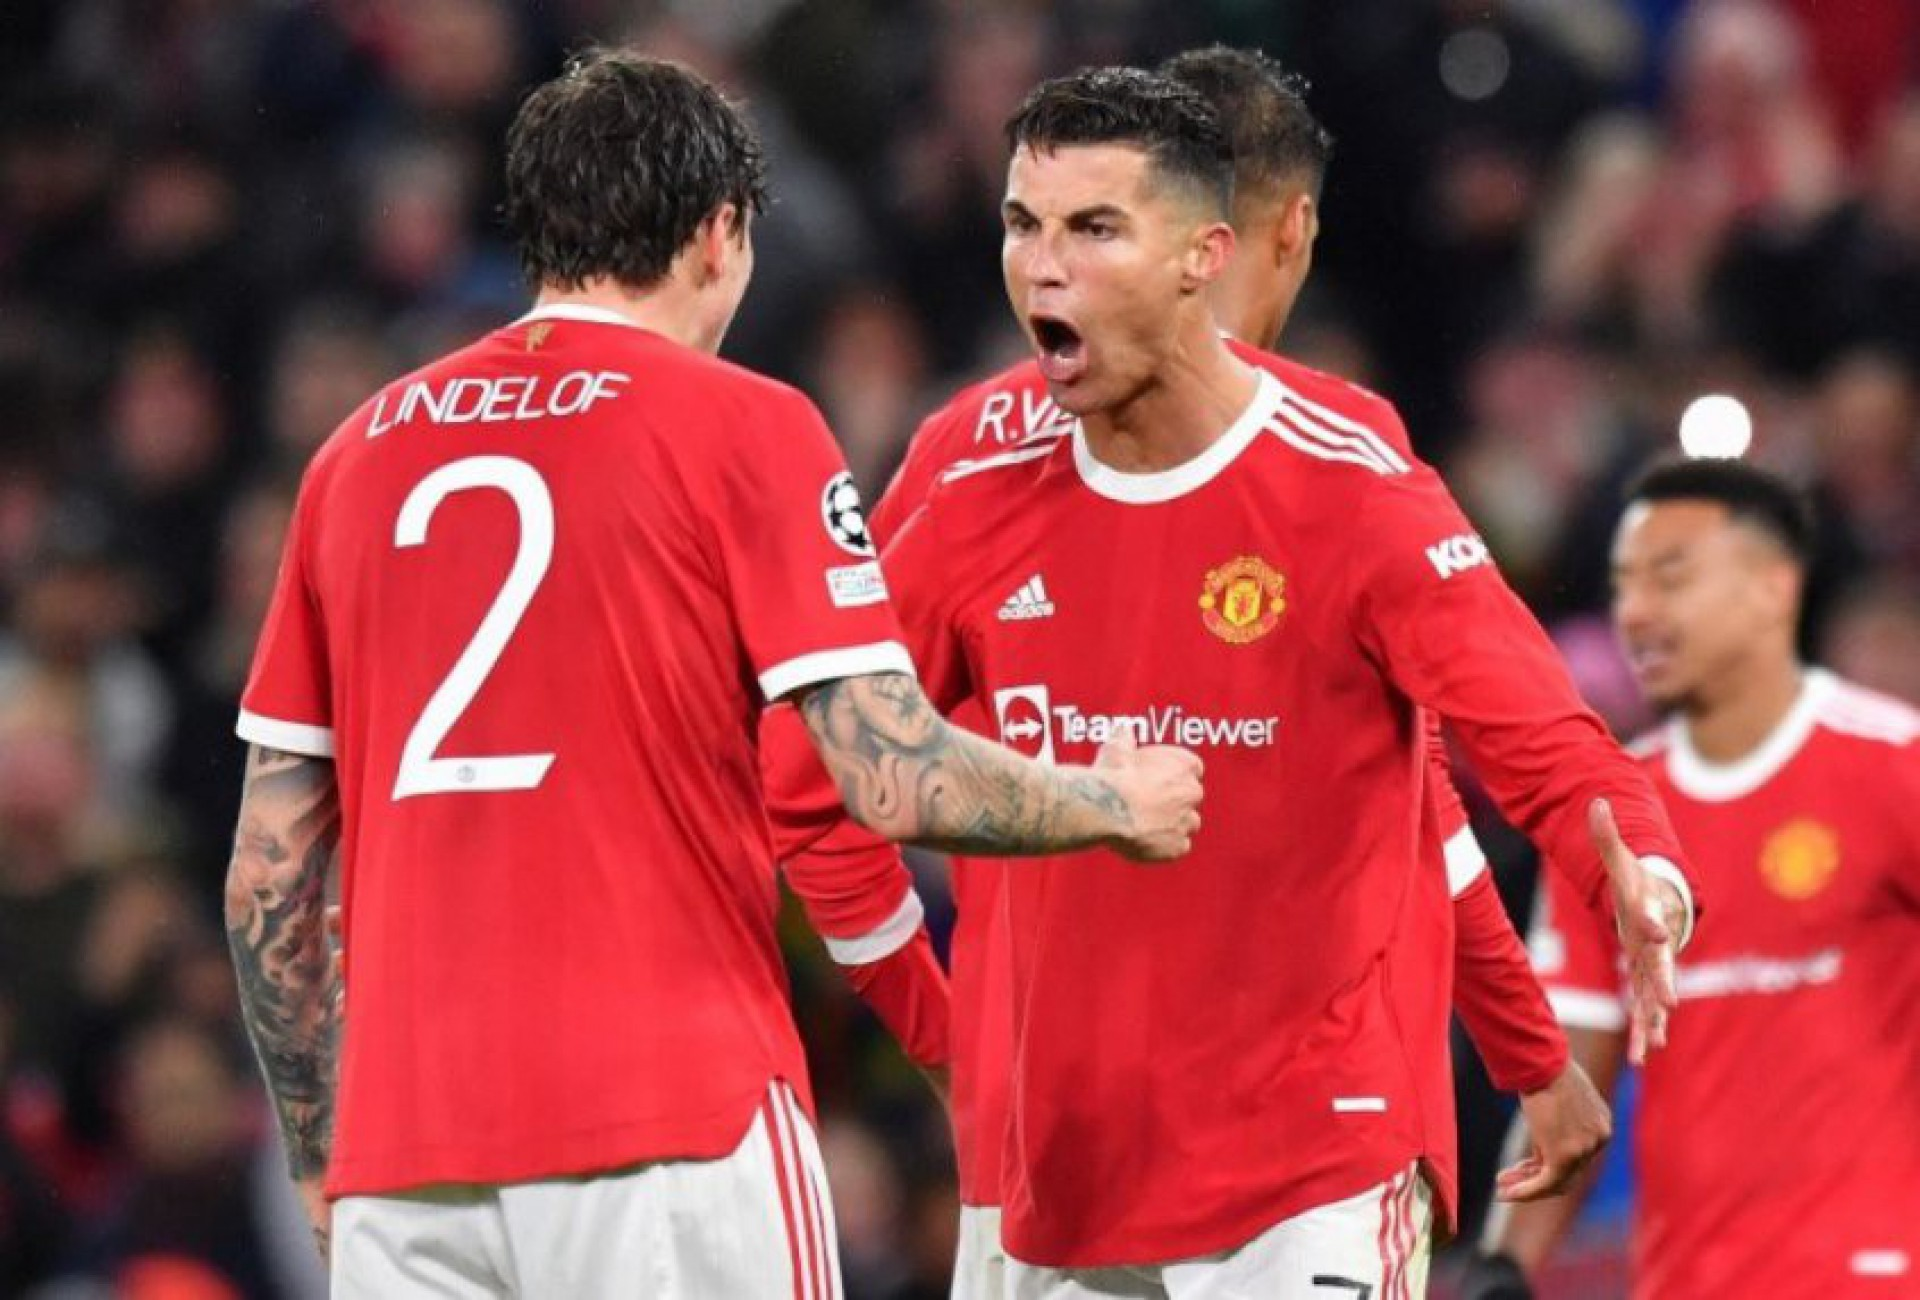 Cristiano Ronaldo marca nos acréscimos e Manchester United vence Villarreal pela Champions League